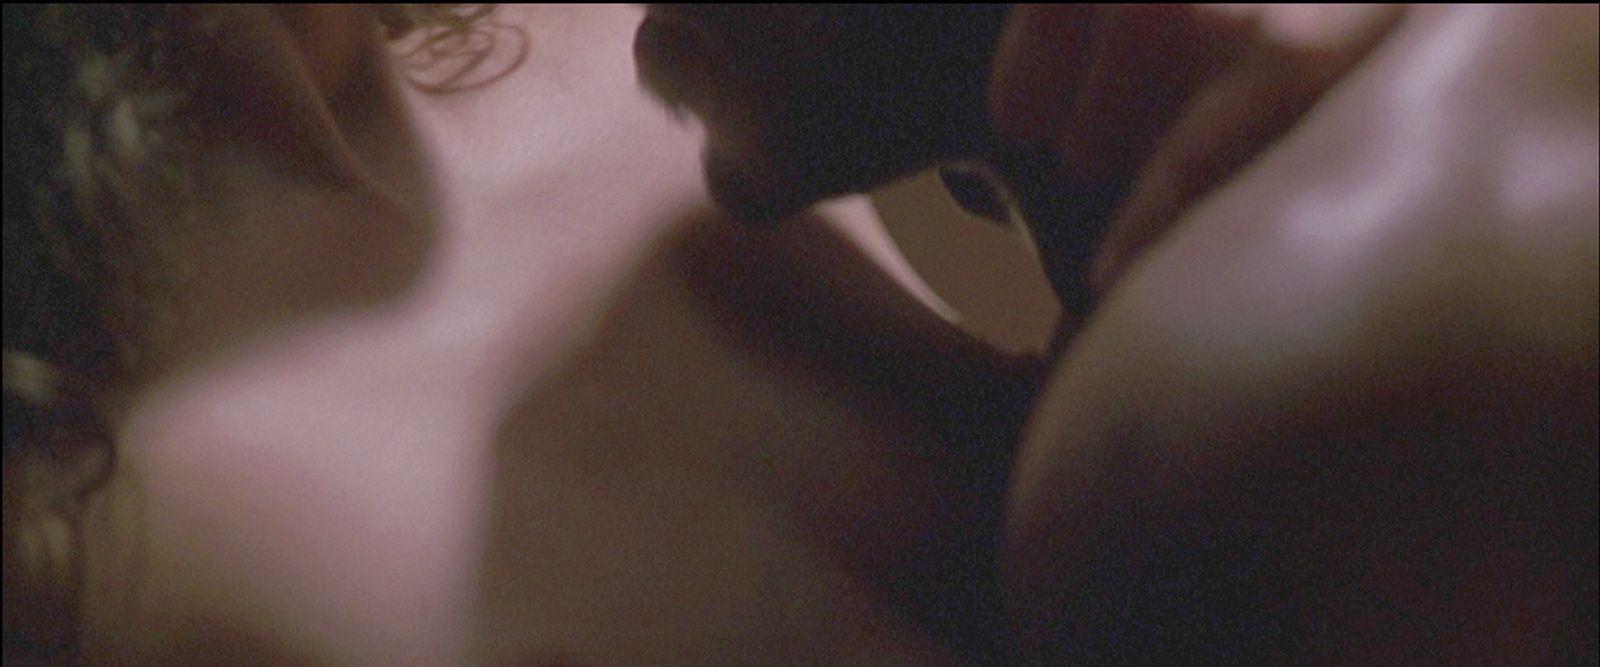 Video clip ways that female nurses take sperm samples